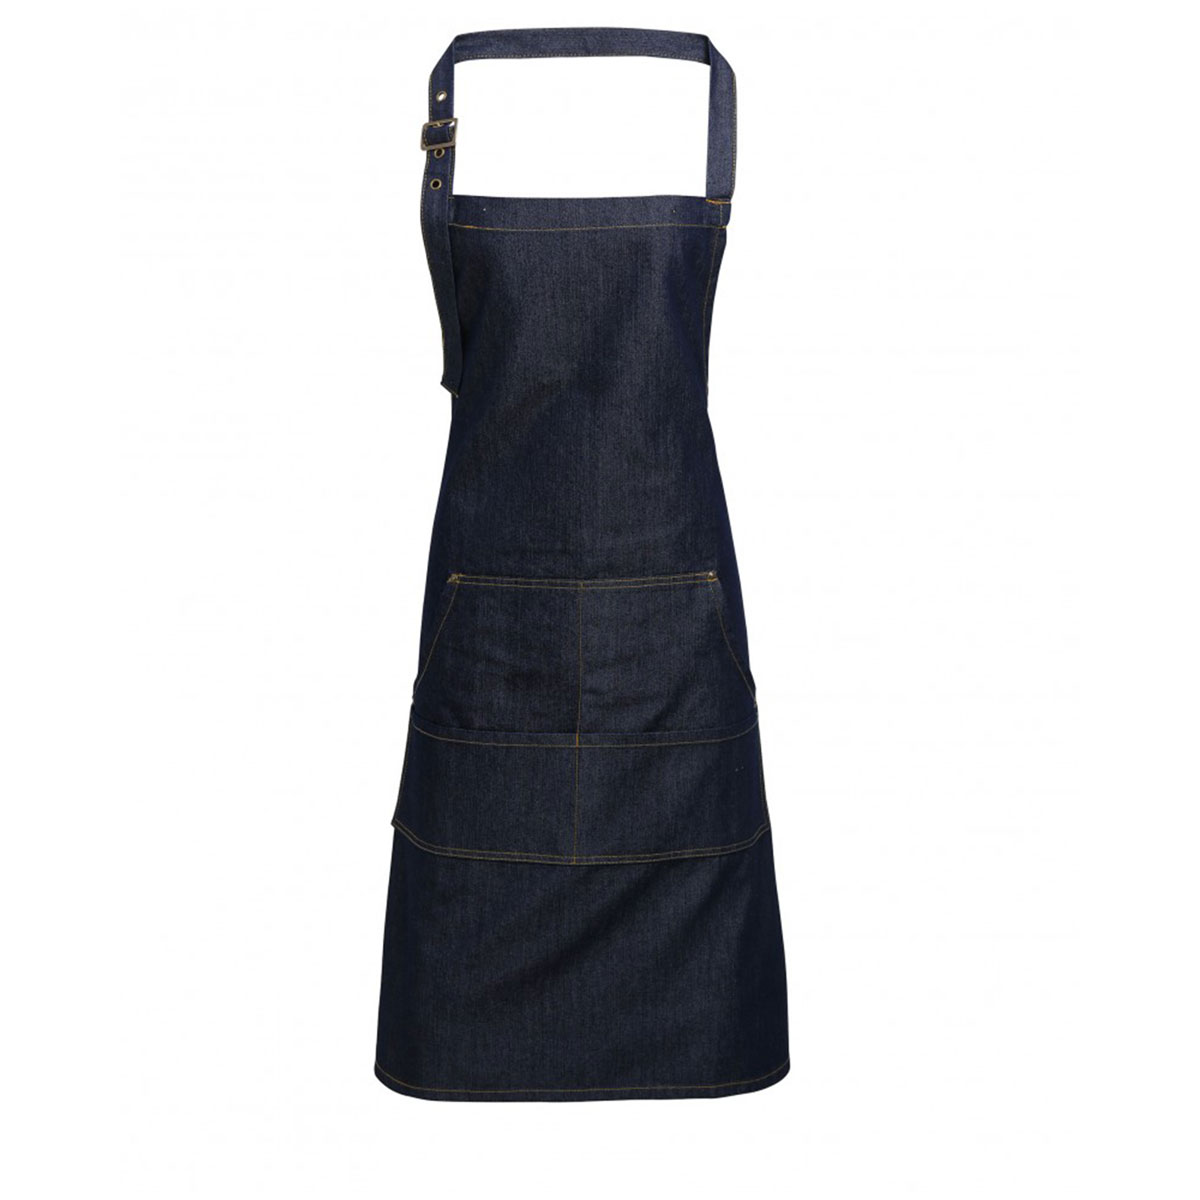 Jeans Stitch Denim Bib Apron - pr126_indigo-denim